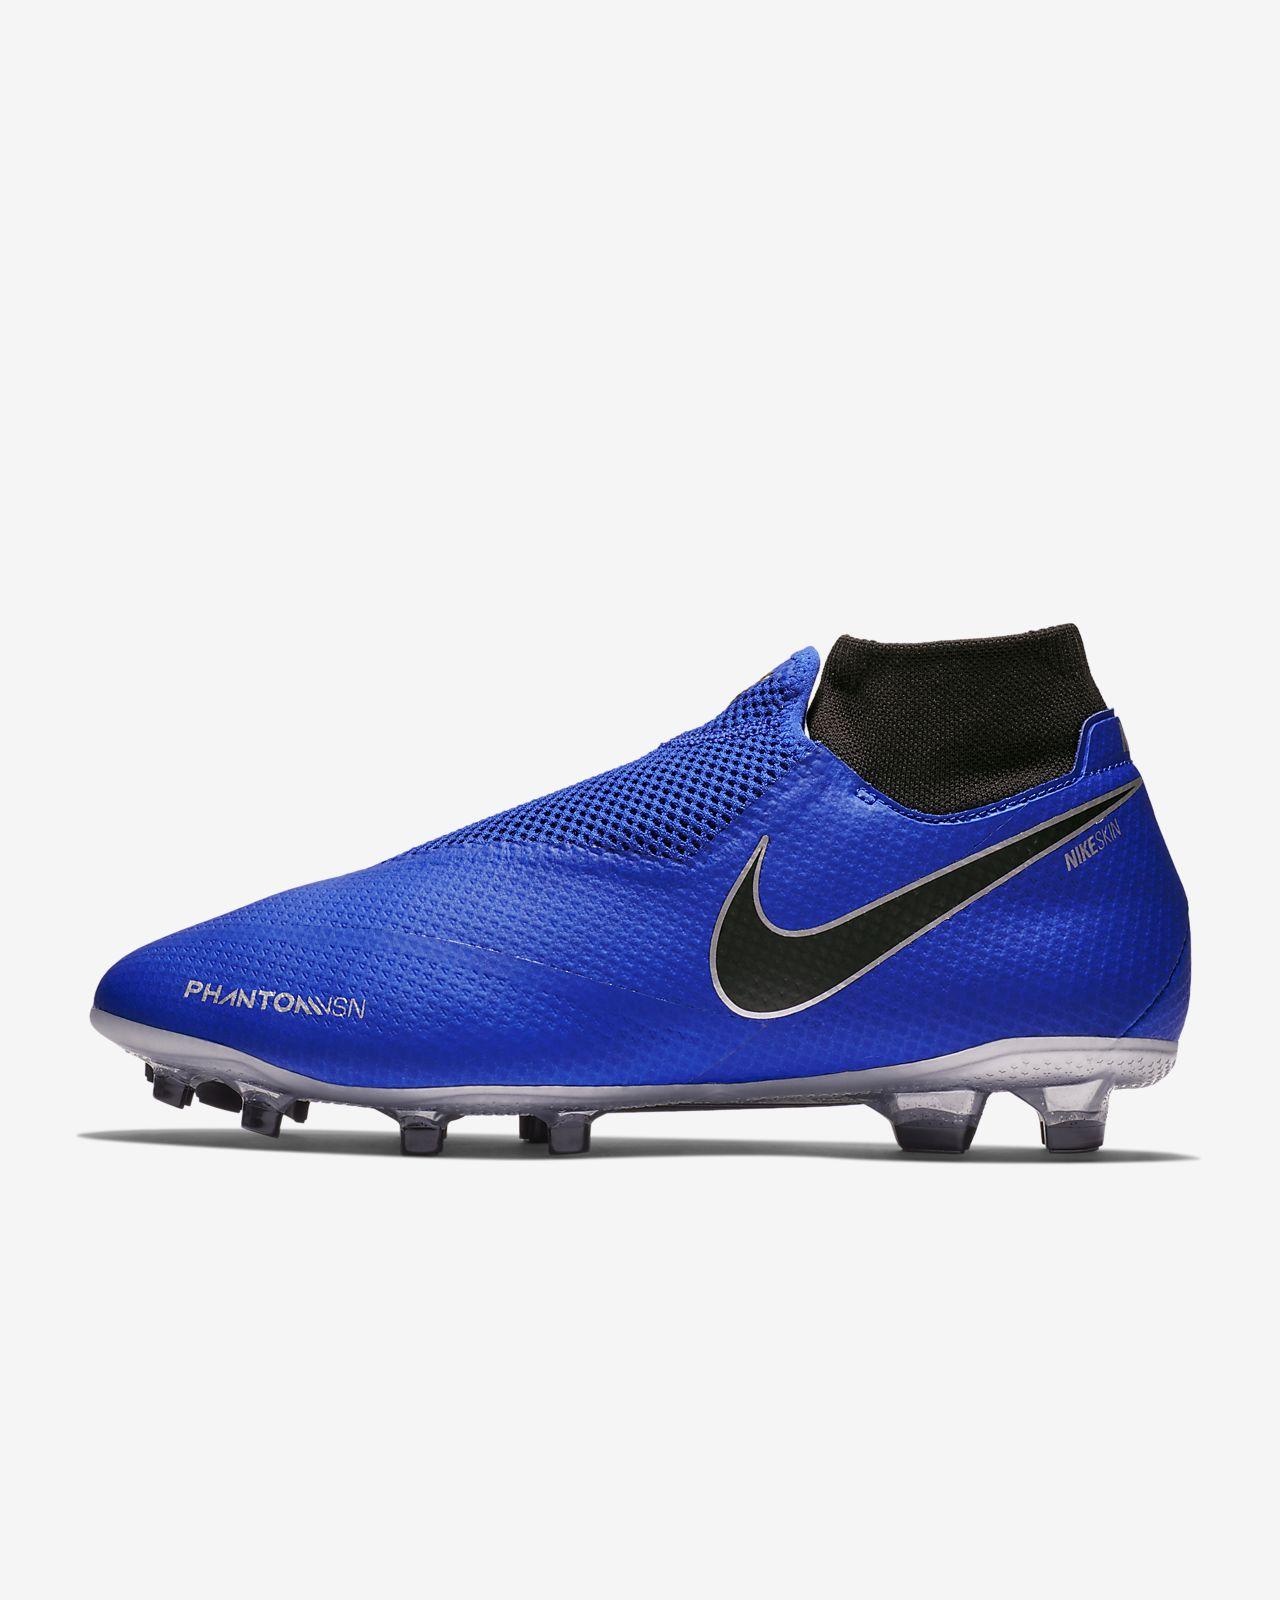 f89da5533 Nike Phantom Vision Pro Dynamic Fit FG Firm-Ground Football Boot ...